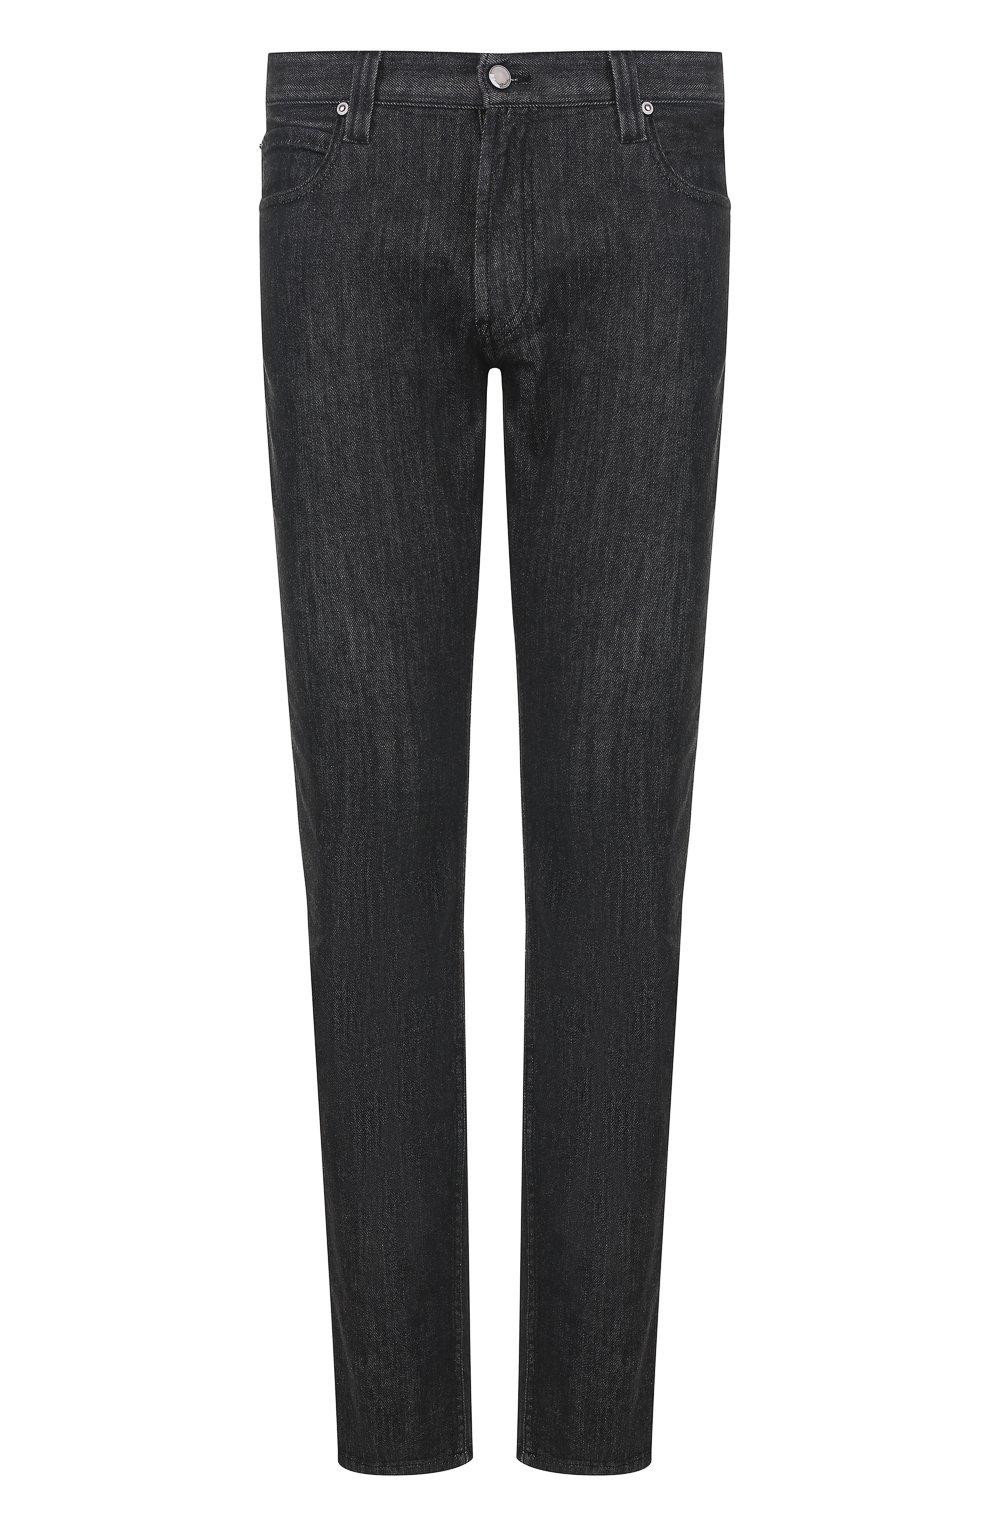 Мужские джинсы прямого кроя GIORGIO ARMANI черного цвета, арт. 6ZSJ15/SD30Z | Фото 1